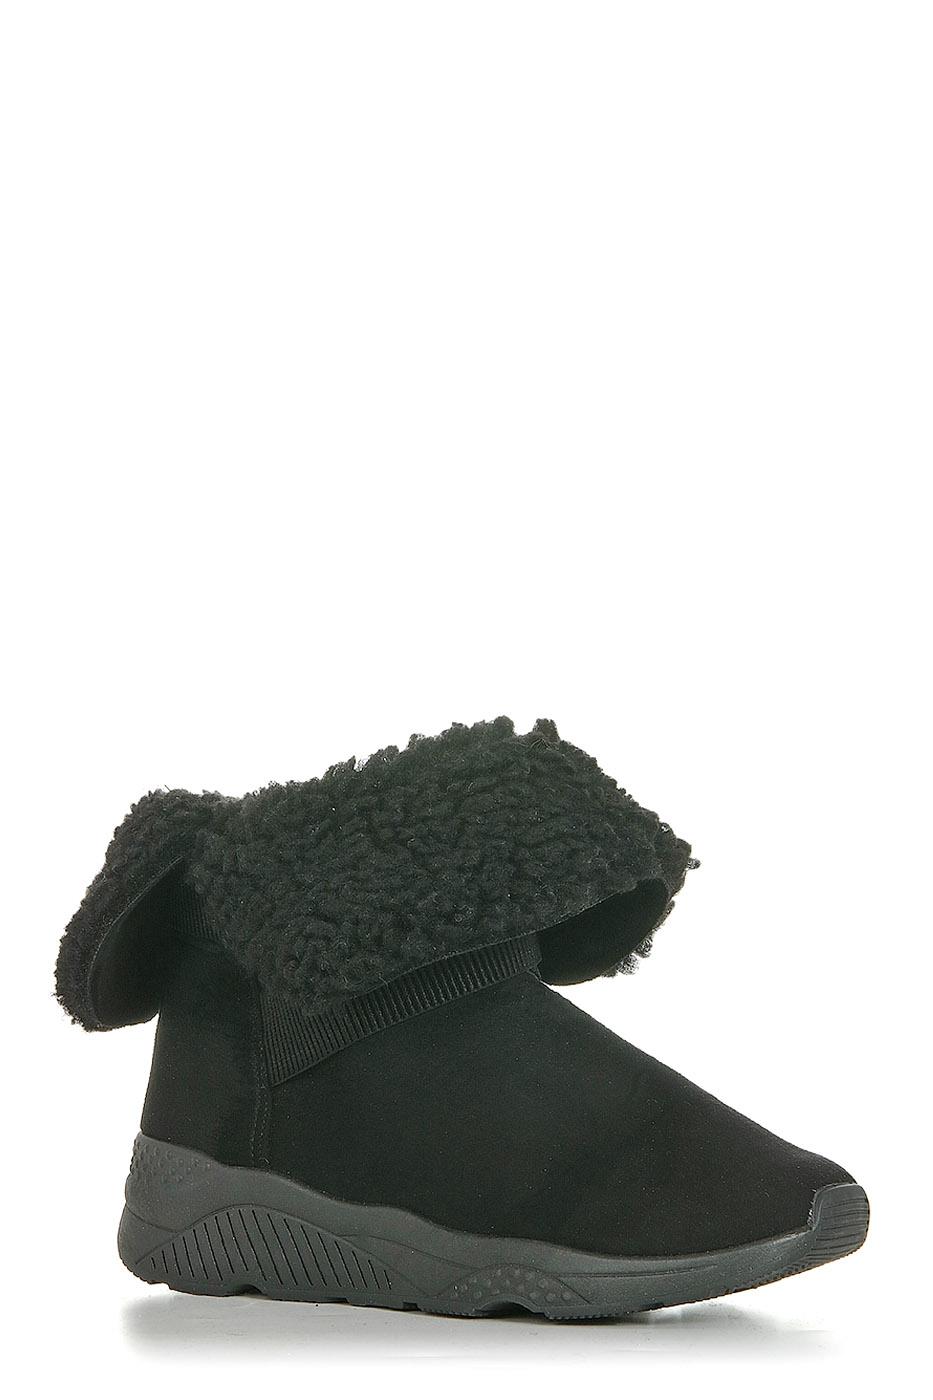 Ботинки TOPLAND2352-PB76170B/BLACK